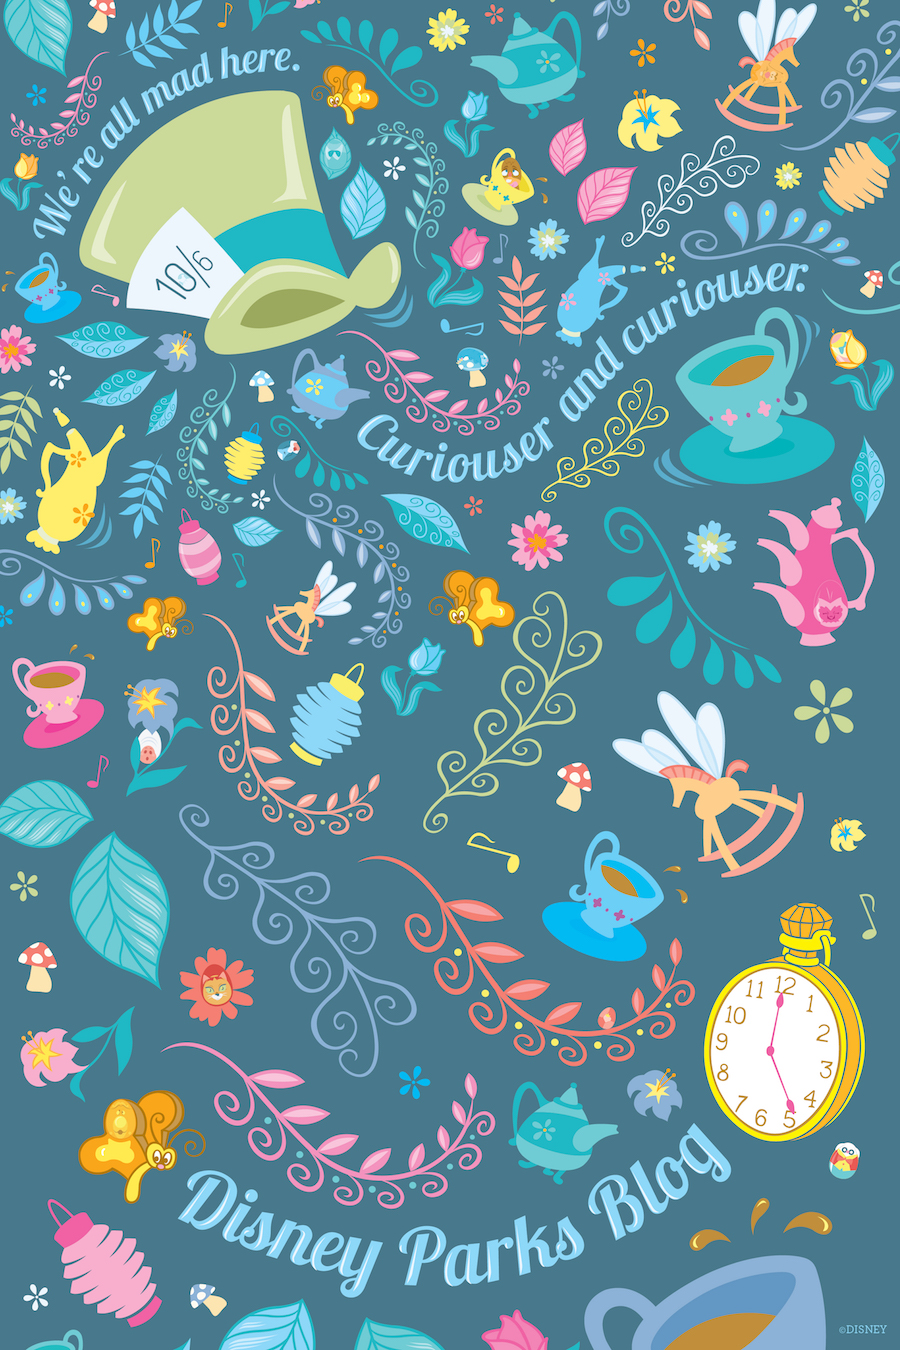 Easter Egg Hunt Wallpaper Mobile Disney Parks Blog 900x1350